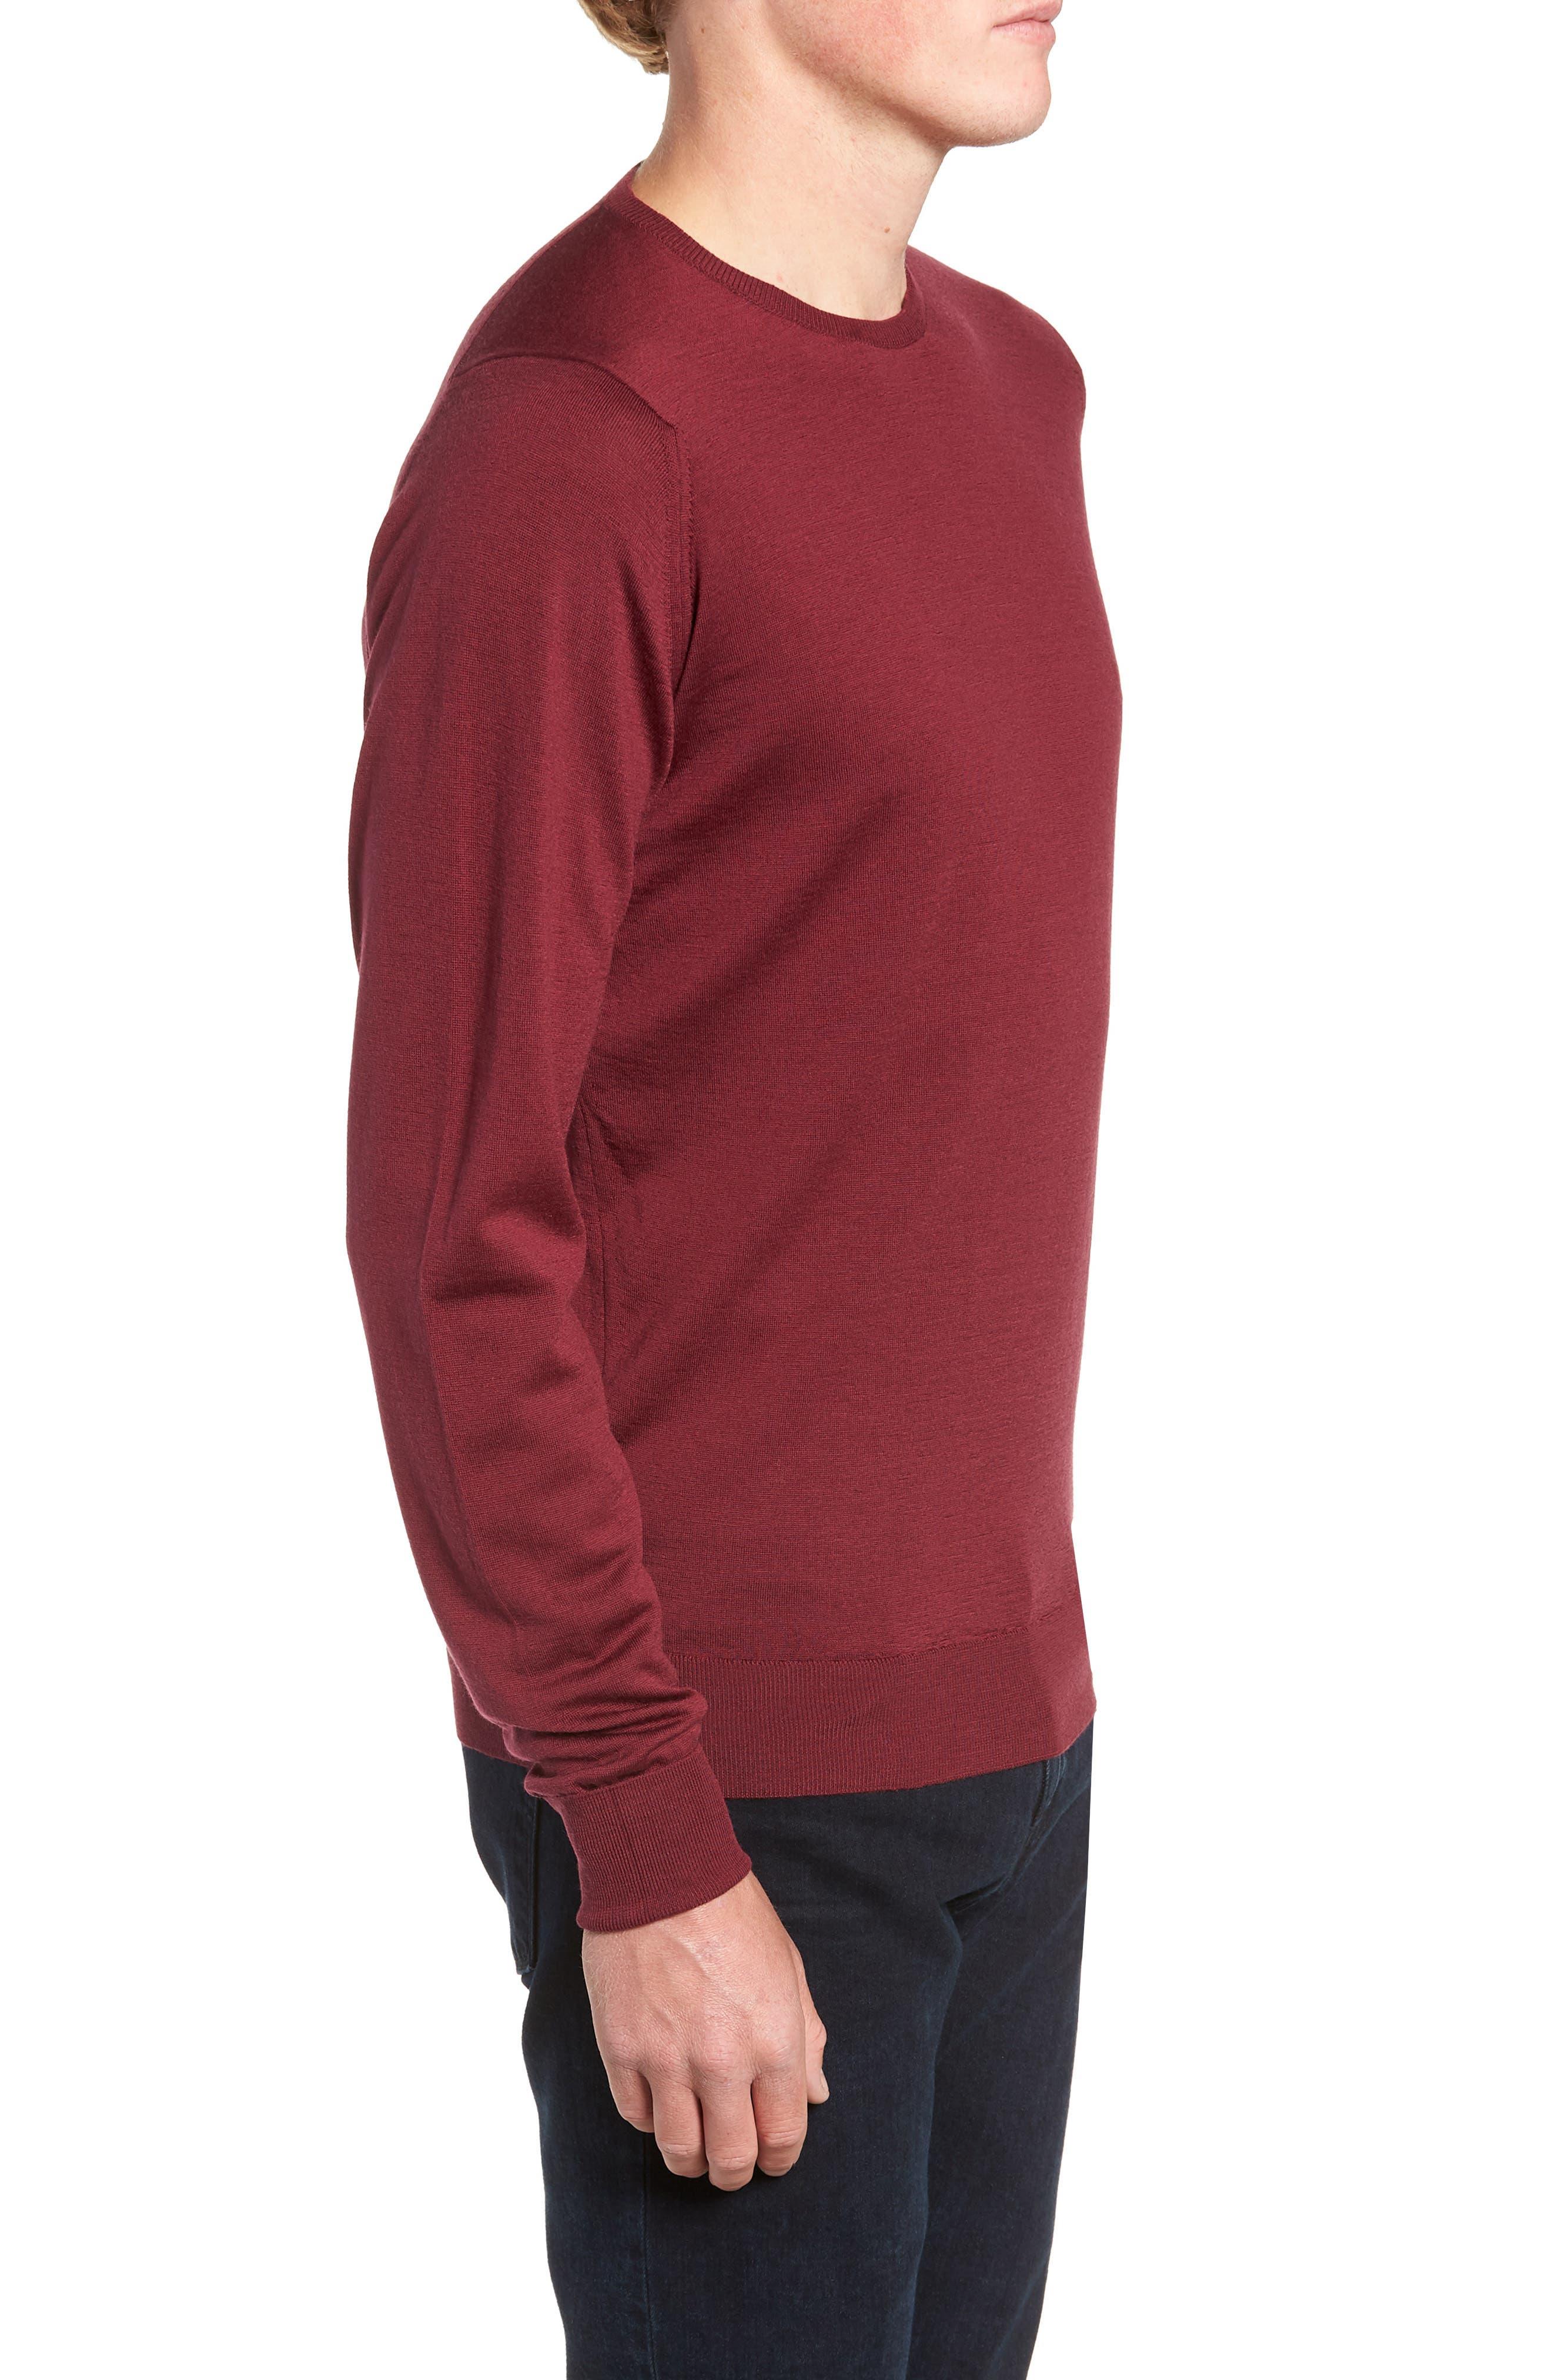 'Marcus' Easy Fit Crewneck Wool Sweater,                             Alternate thumbnail 3, color,                             BOREDAUX